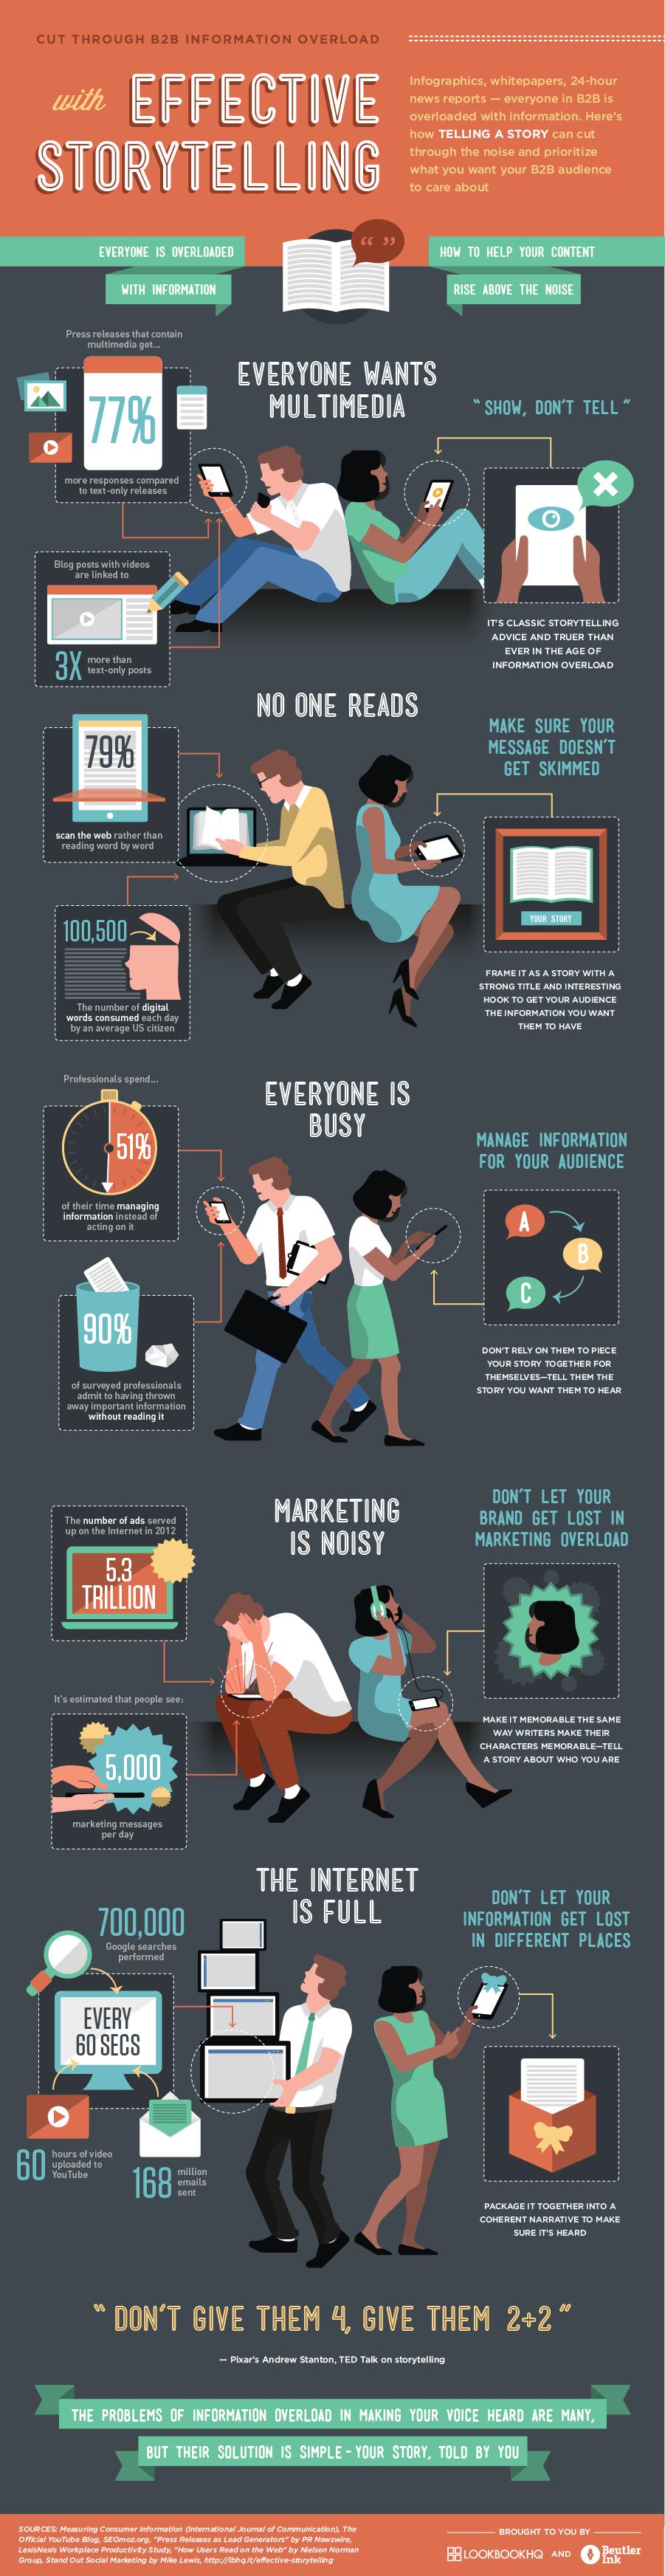 Storytelling B2B Marketing-Infographic